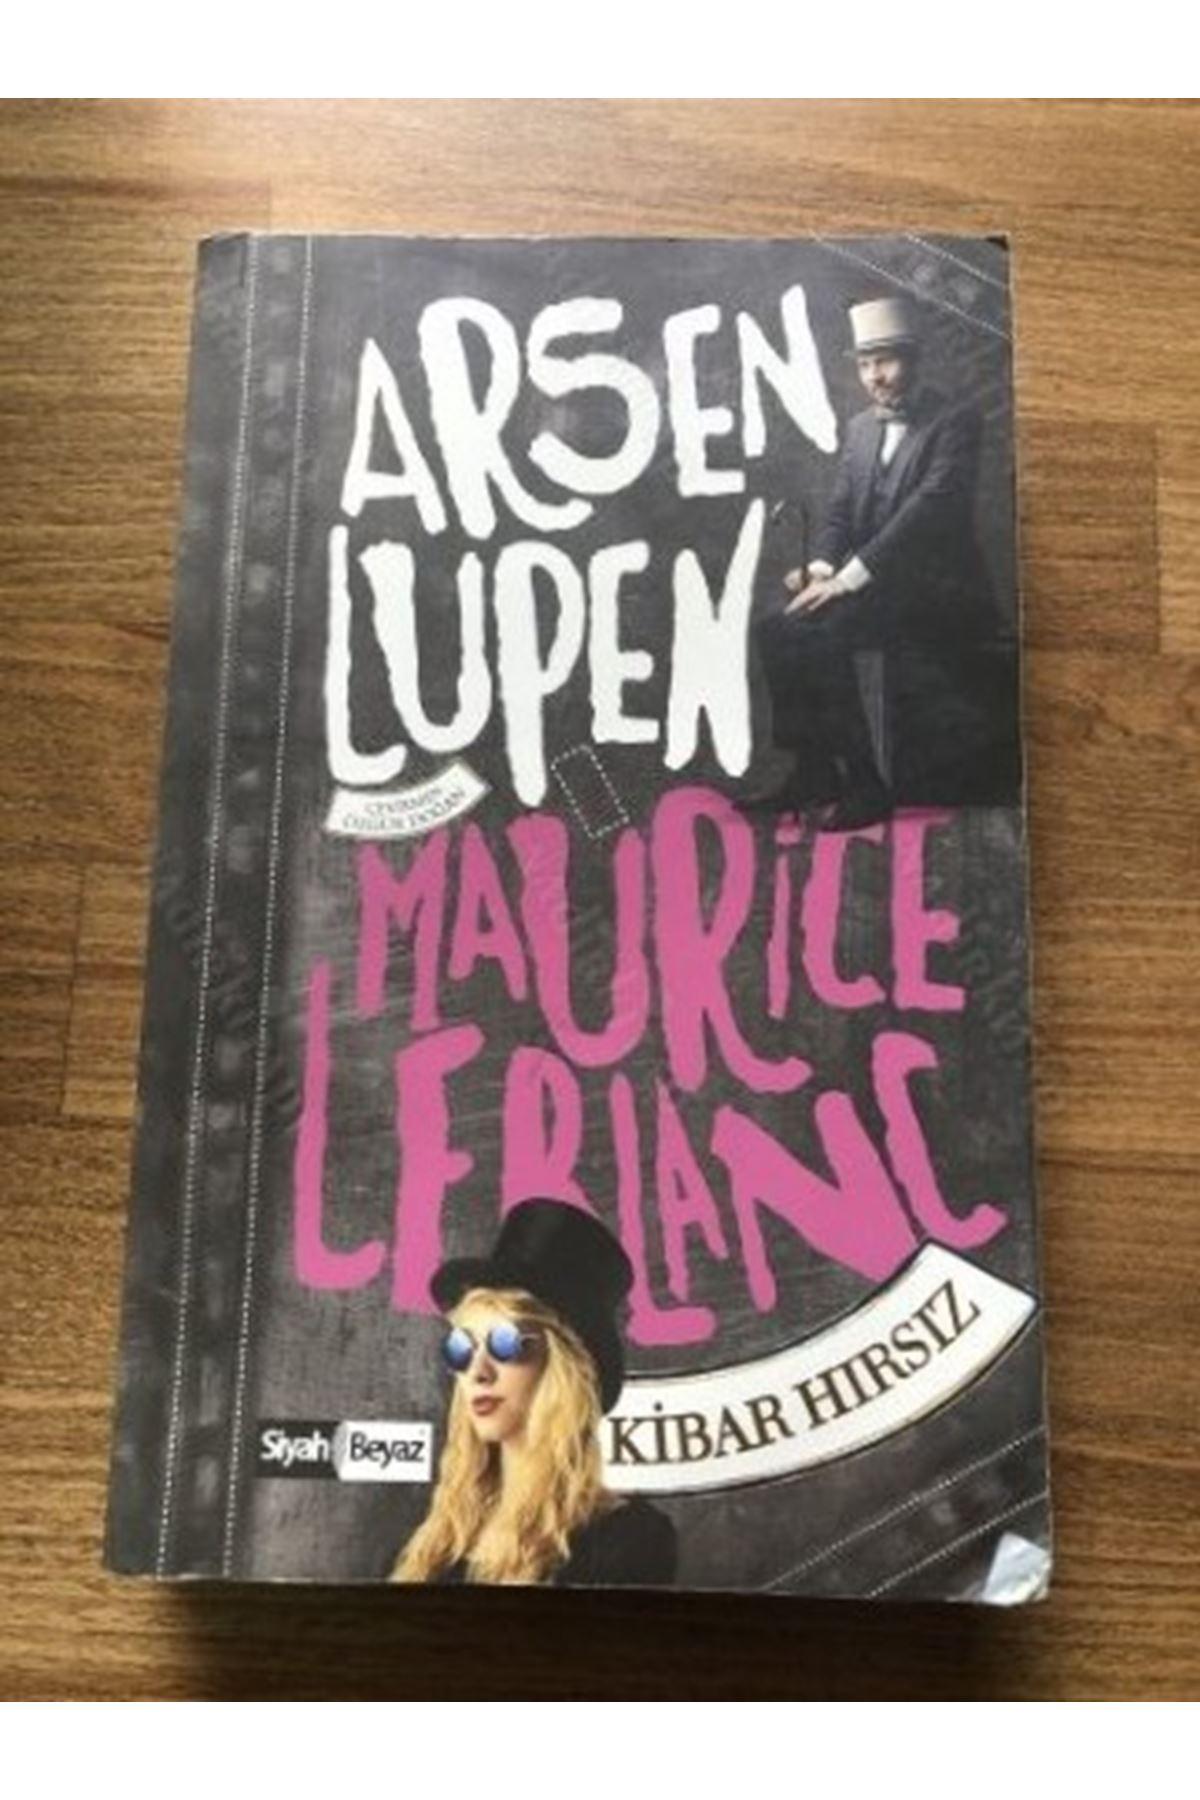 MAURİCE LEBLANC - ARSEN LUPEN